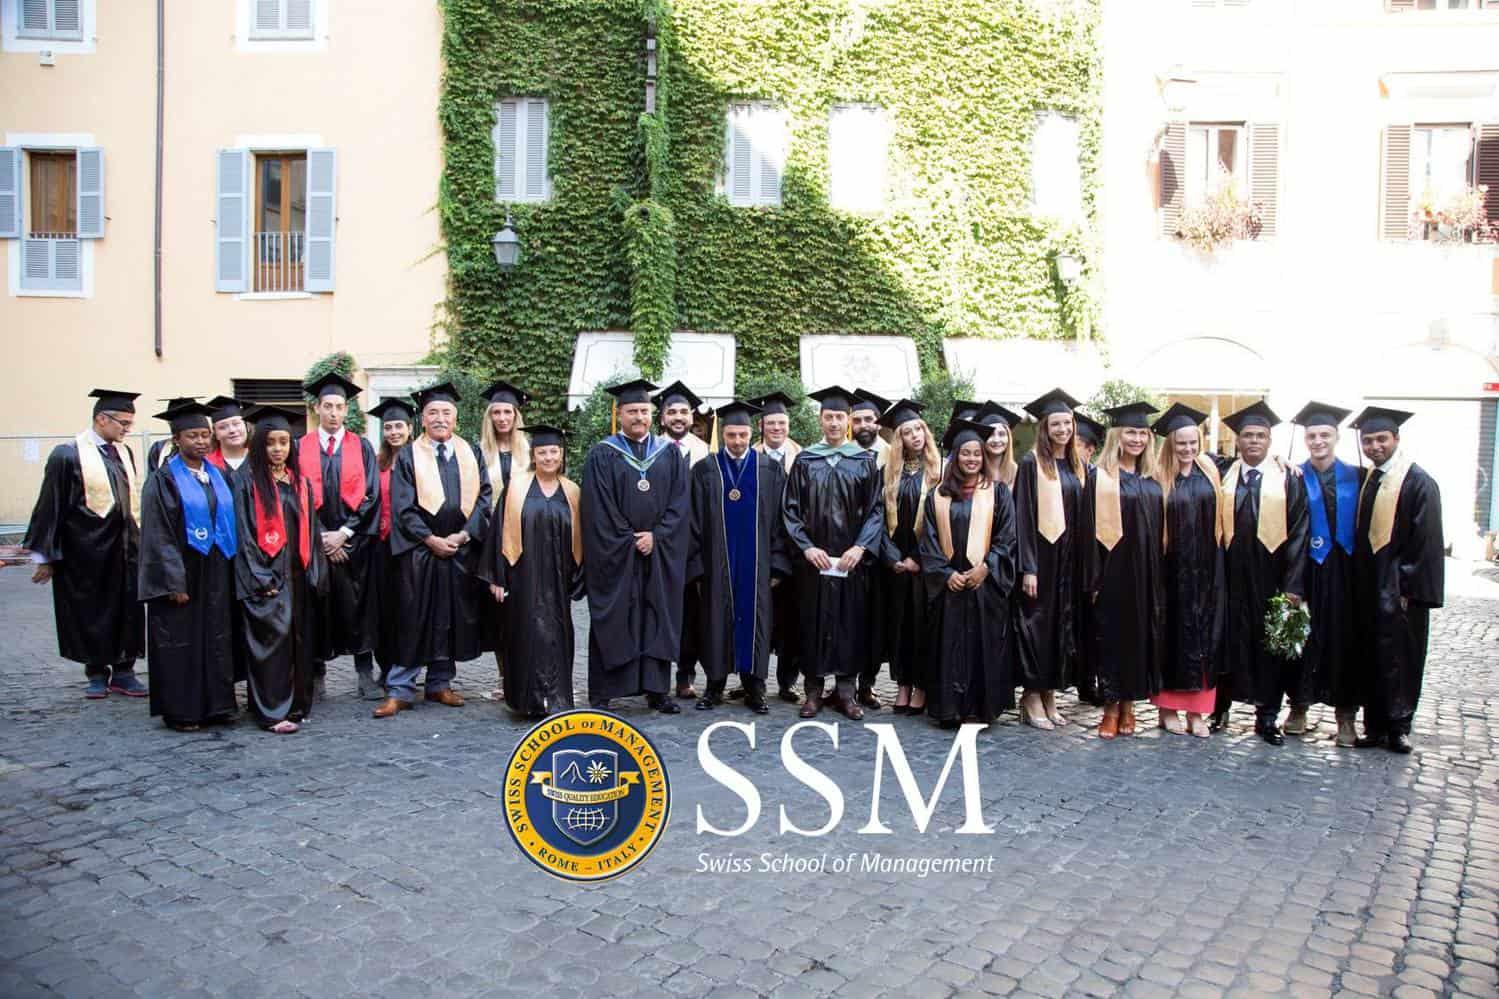 Swiss School of Management - SSM Campus